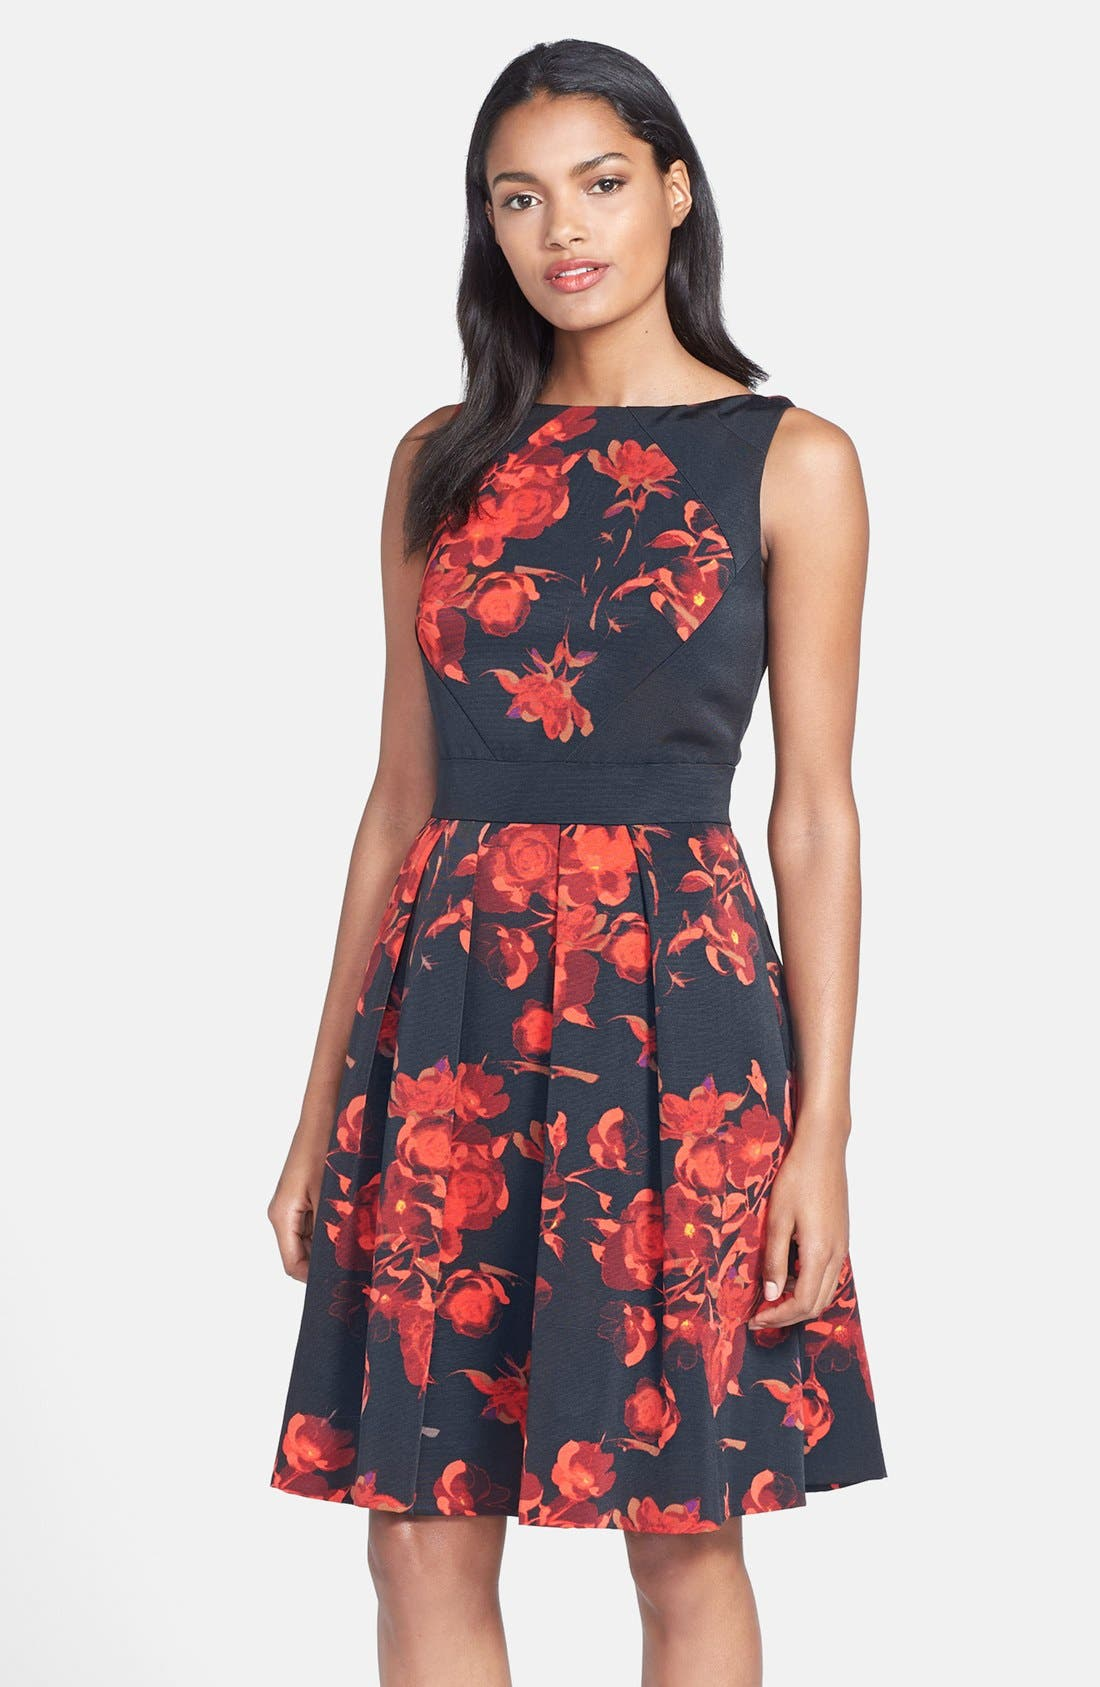 Alternate Image 1 Selected - Taylor Dresses Floral Print Fit & Flare Dress (Regular & Petite)